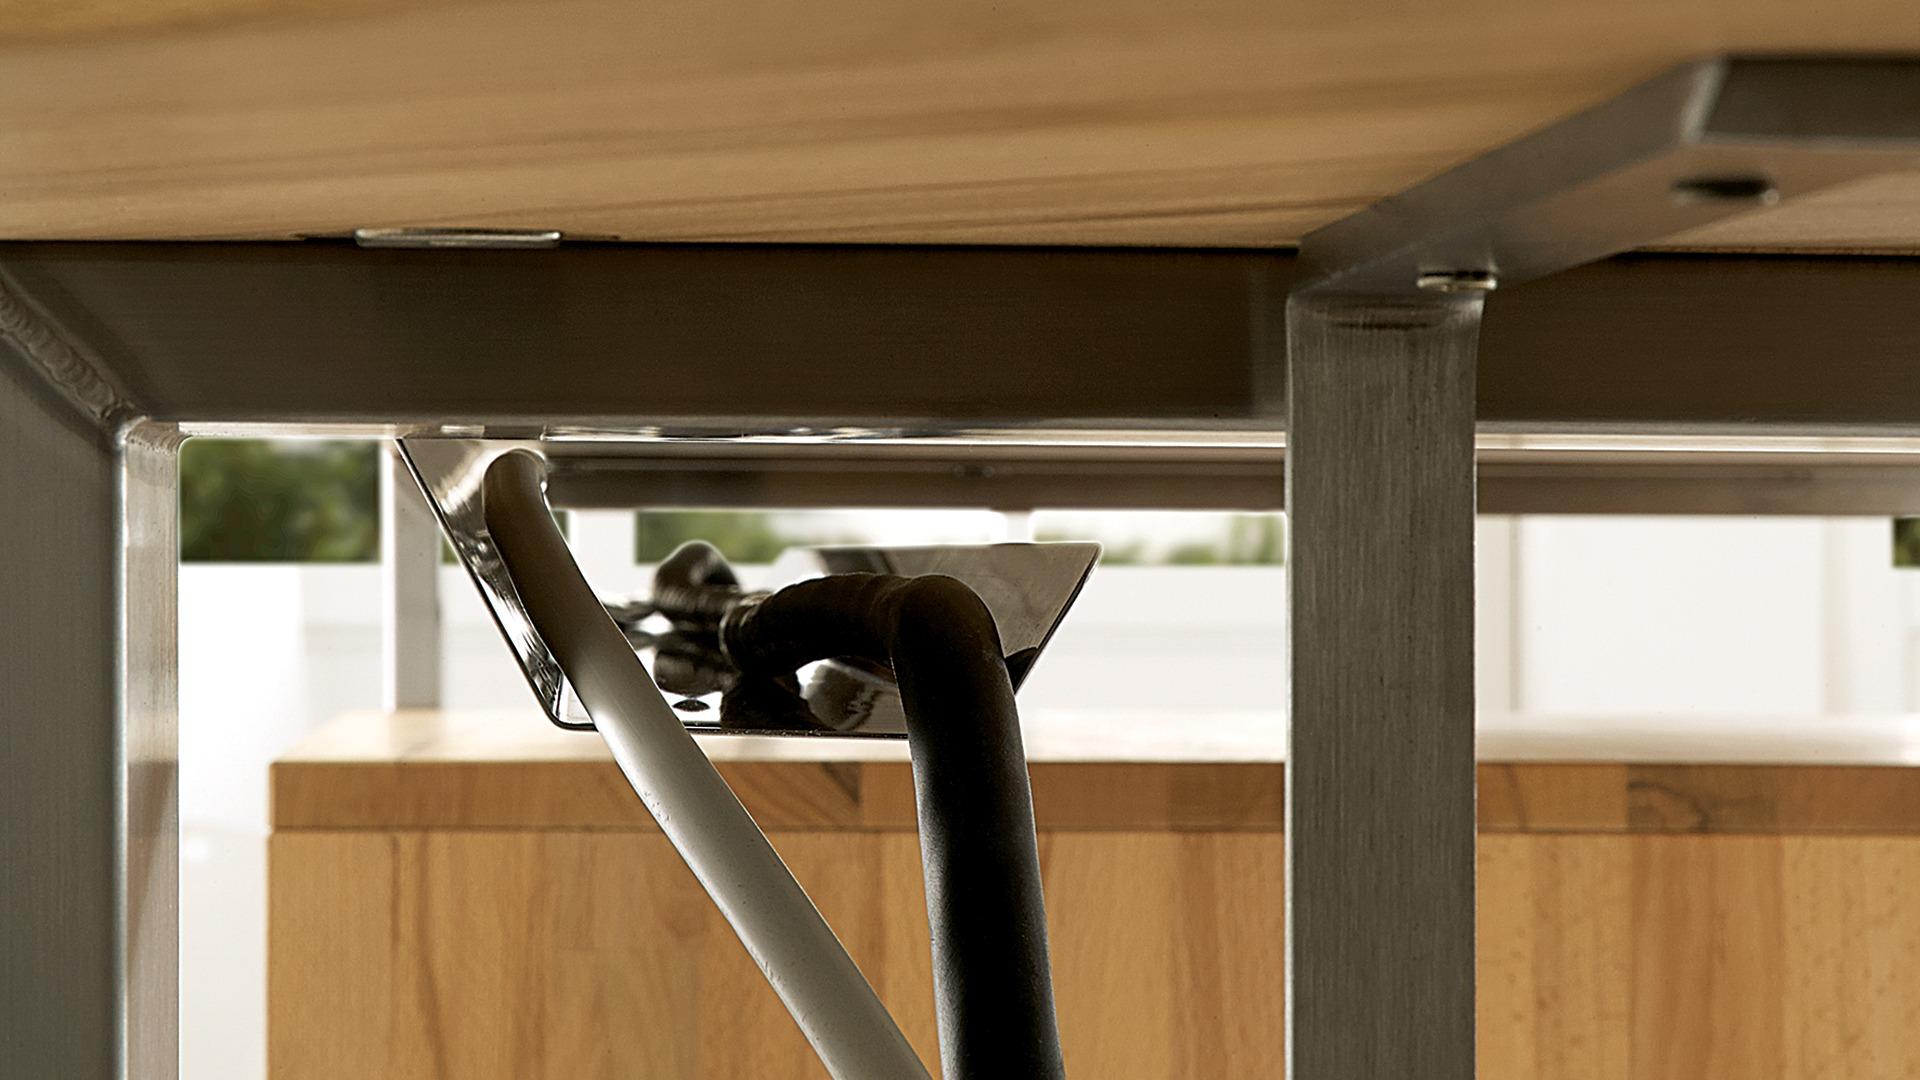 schreibtisch kabelkanal calva. Black Bedroom Furniture Sets. Home Design Ideas